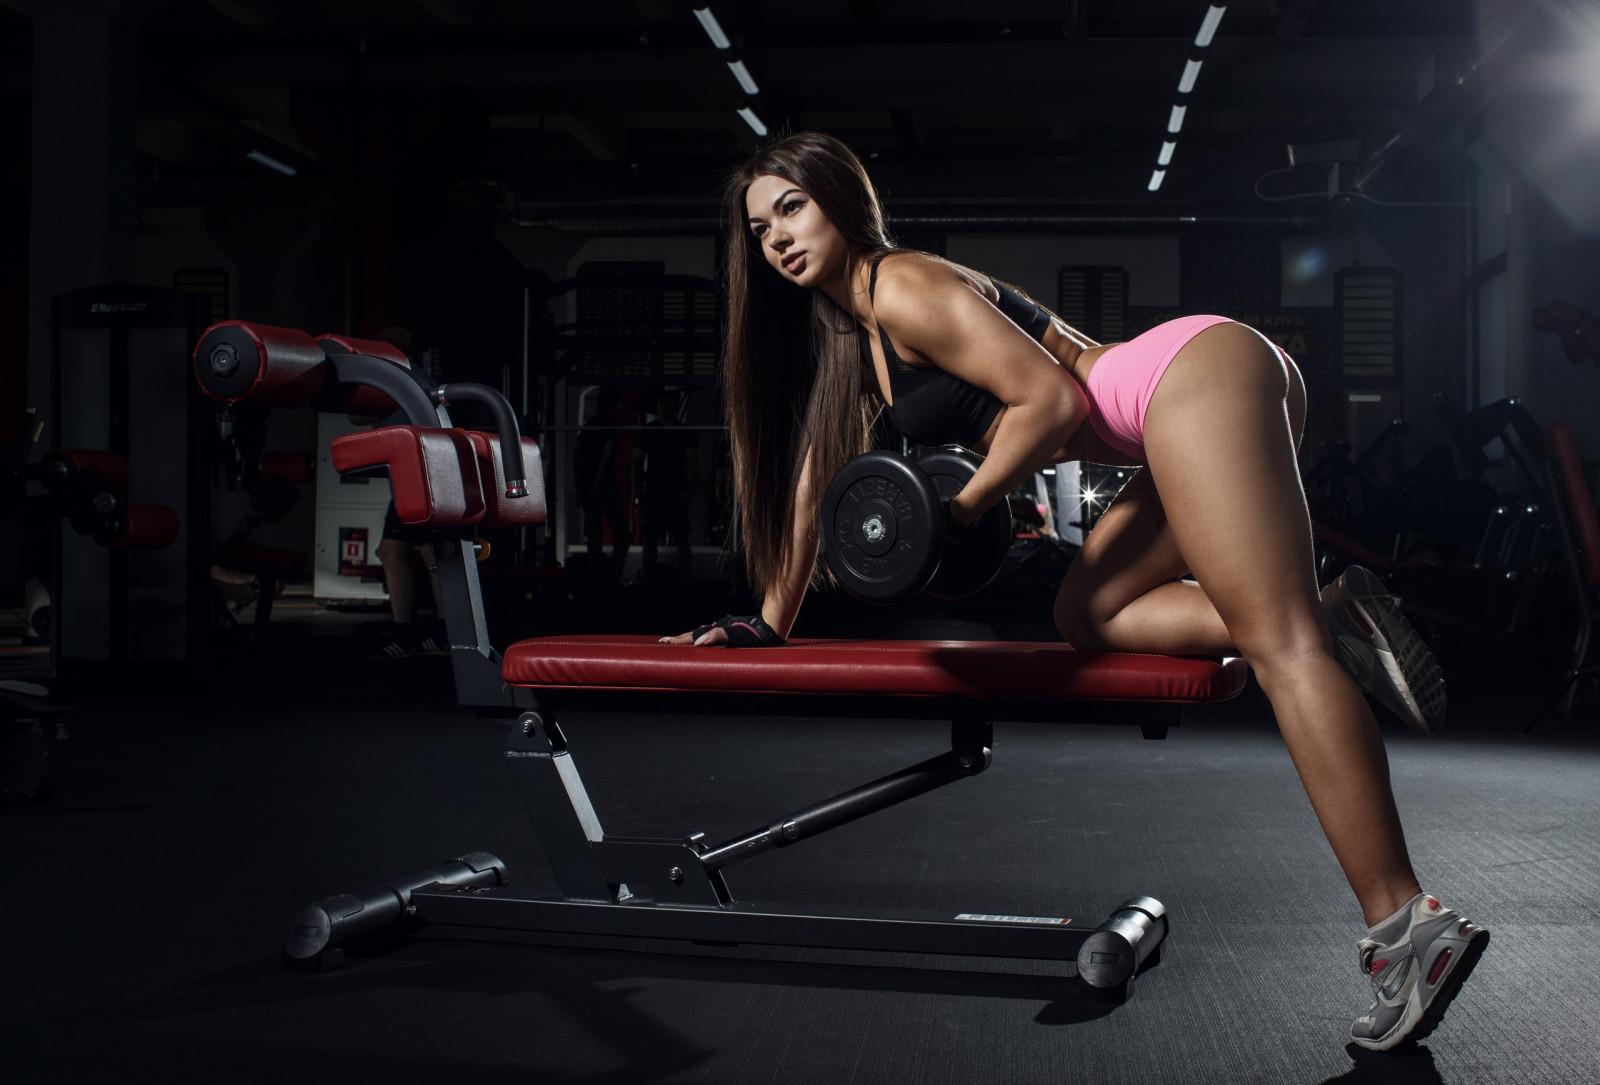 Клип три девушки в спортзале 2